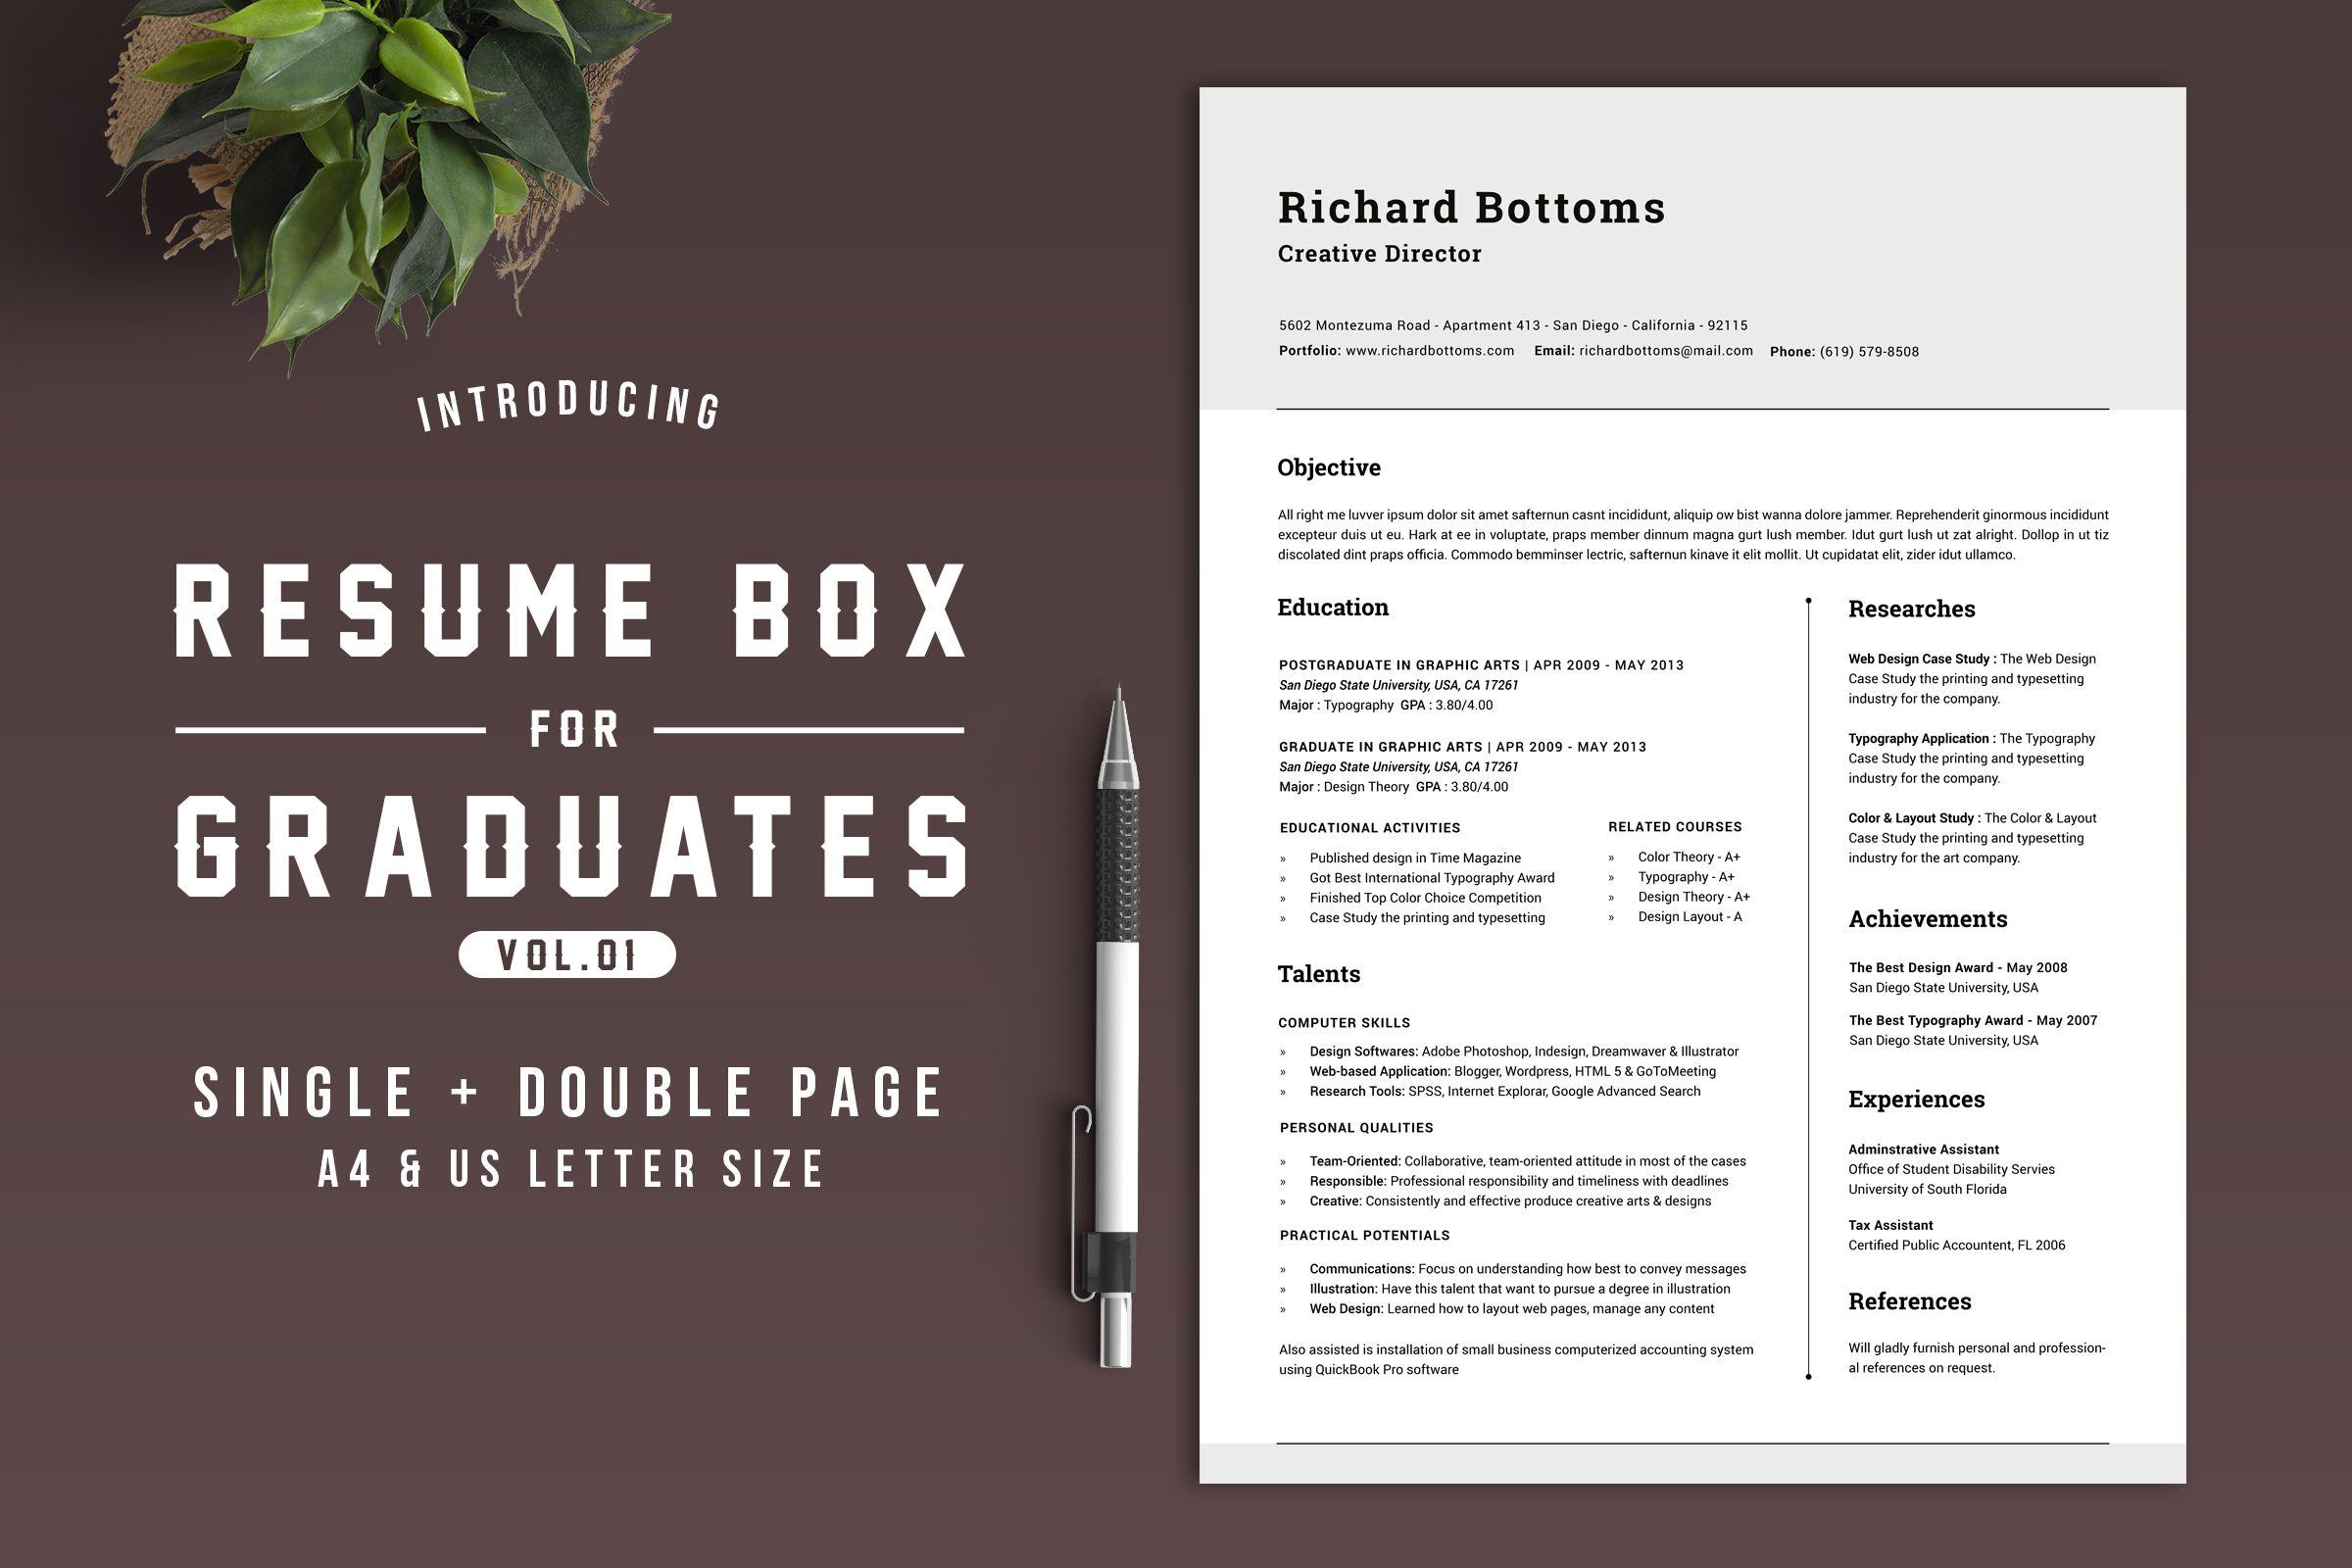 Plant Accountant Sample Resume Entrancing Resume Box For College Graduates V.1  Design Packaging